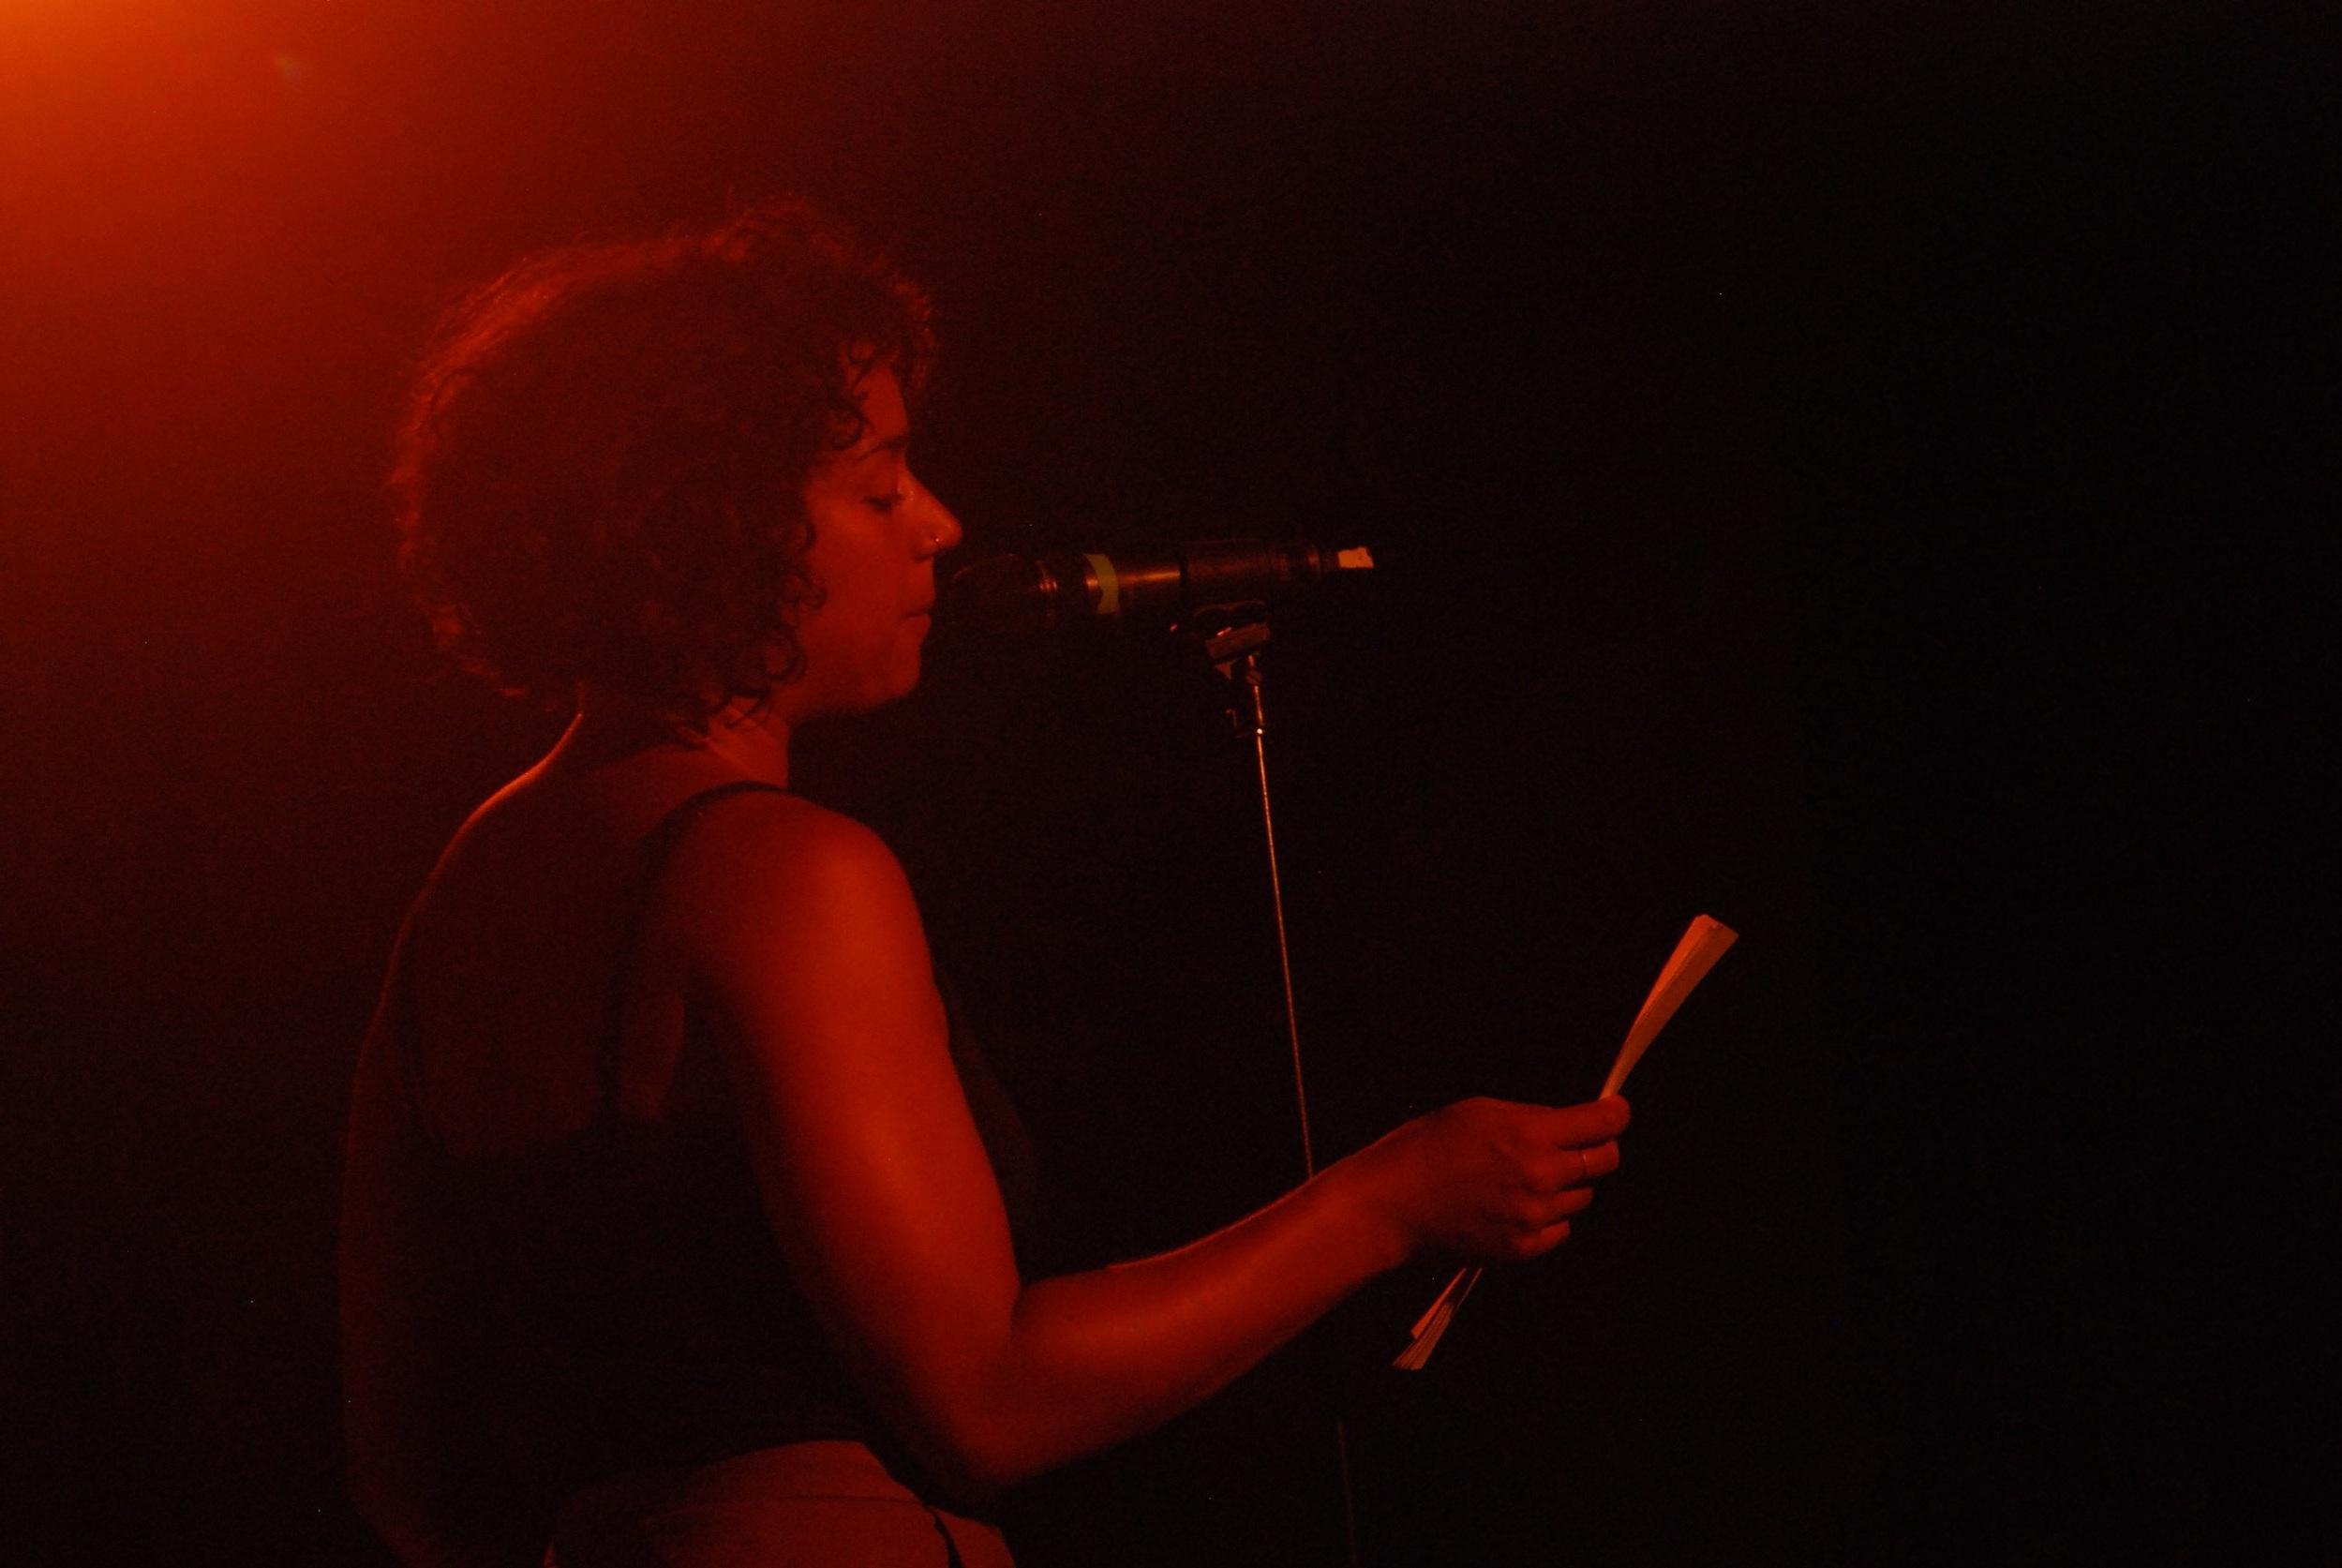 Sara Joy Marquez